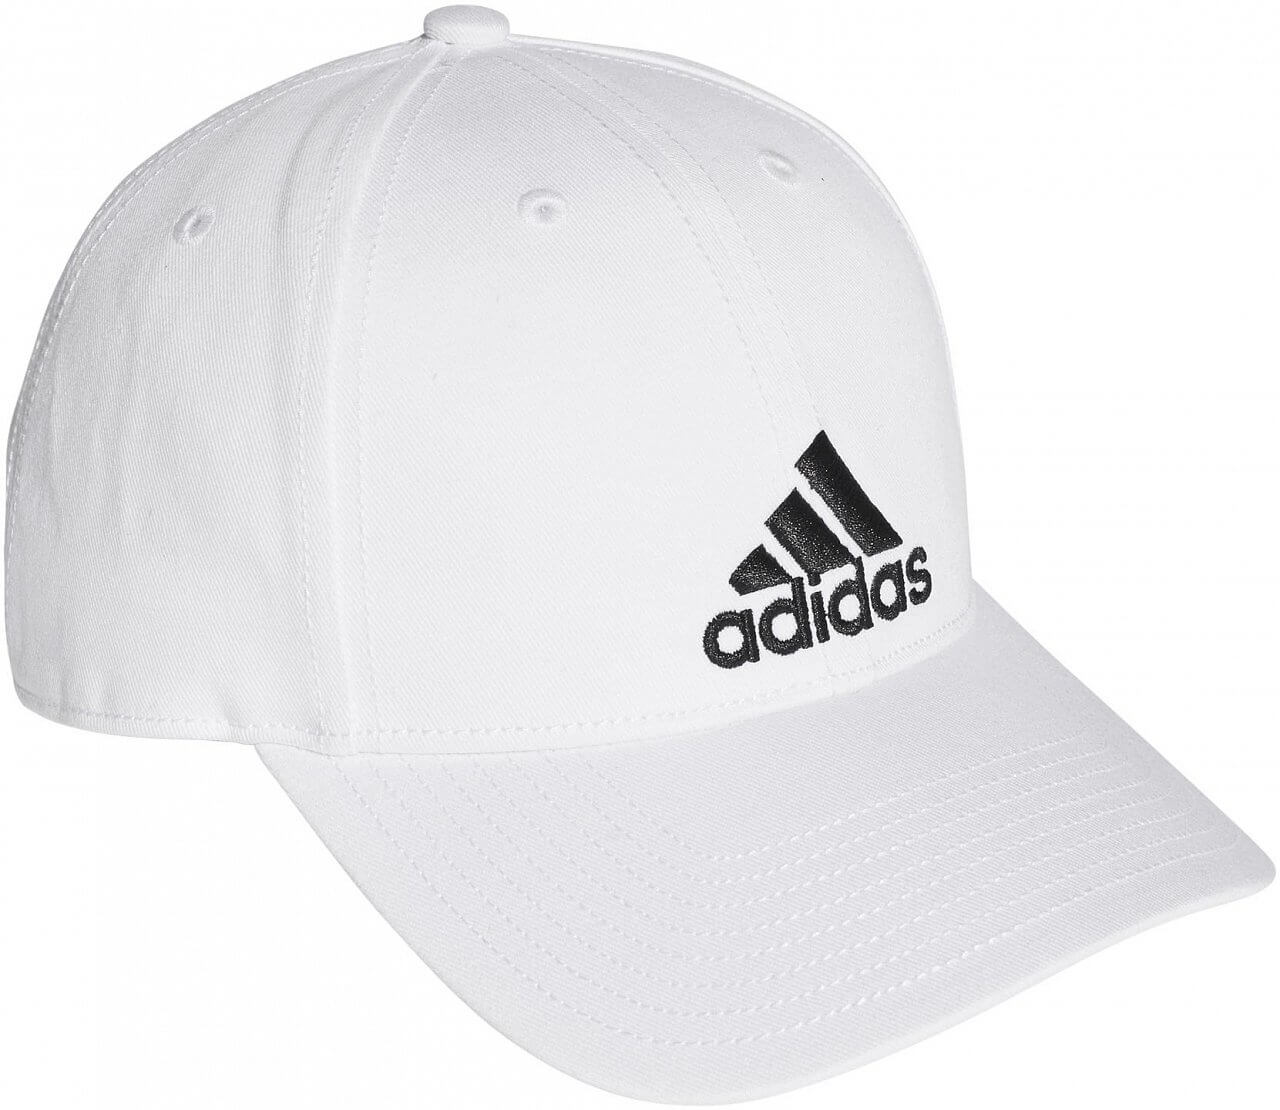 30c2892d298 adidas 6P Cap Cotton. Kšiltovka